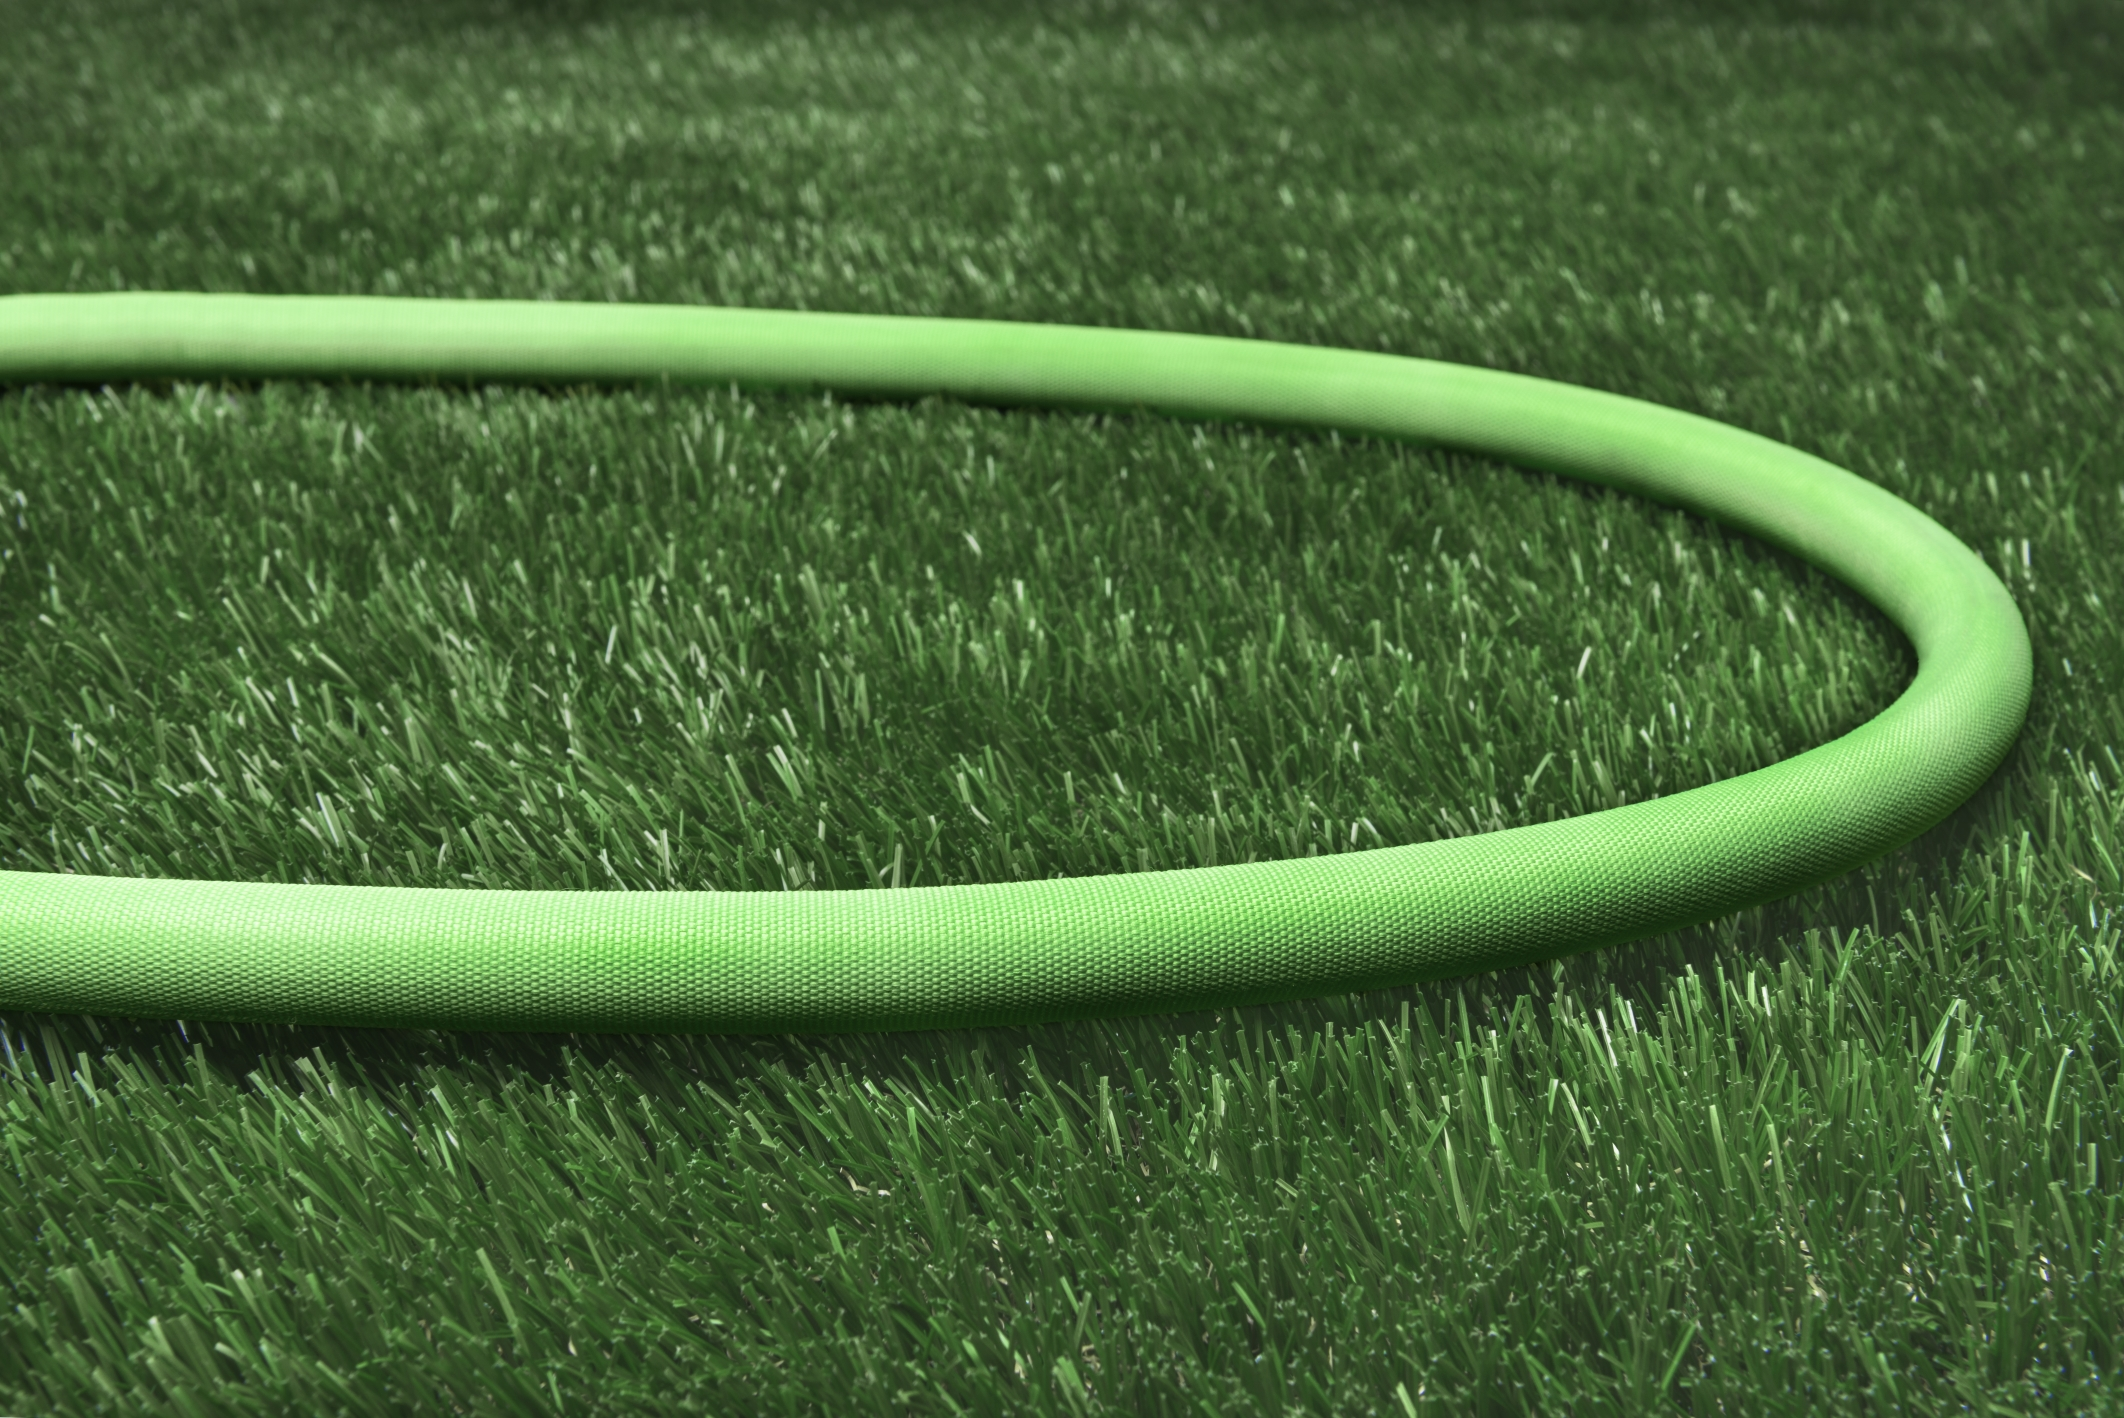 Hydrohose Designer Series Expandable Garden Hose 50 39 Metal Ebay